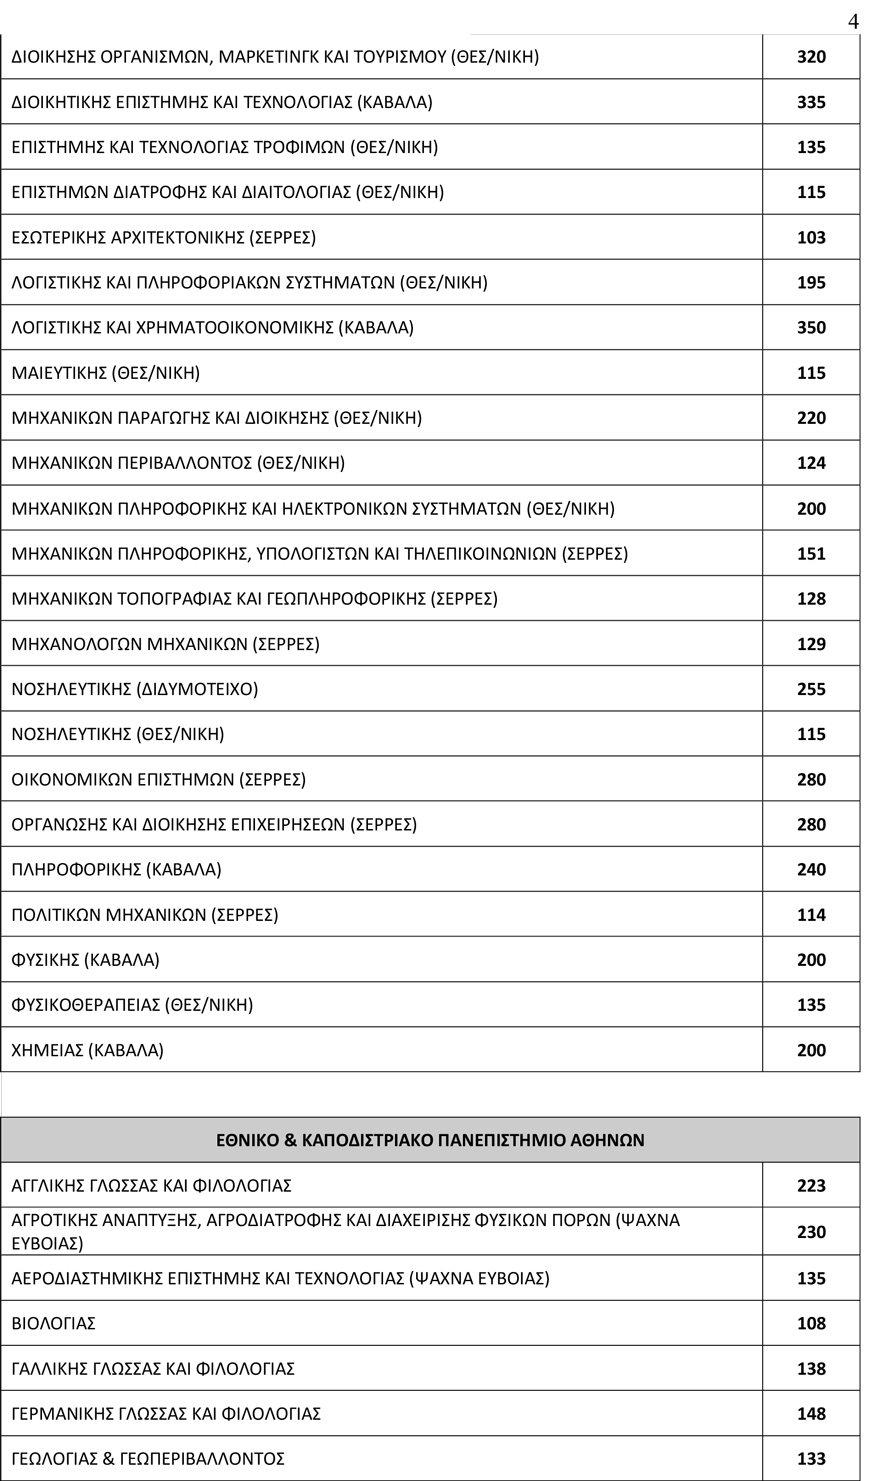 arrithmos_eisakt4 78.335 θα εισαχθούν φέτος στα Πανεπιστήμια - Αυξημένος κατά 3.500 ο αριθμός